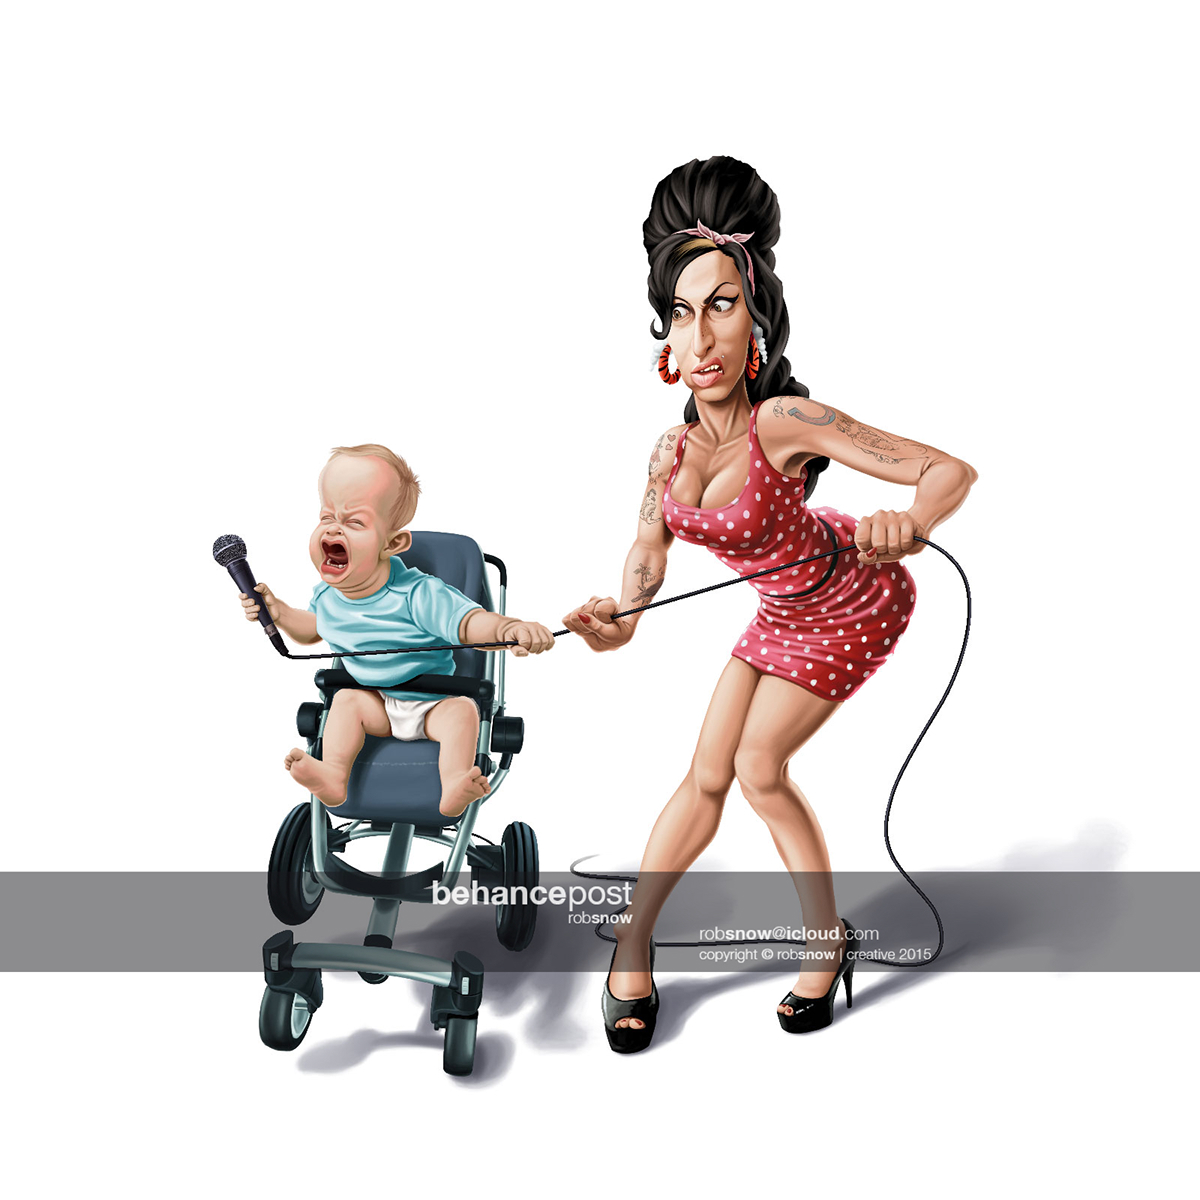 amy winehouse blackninja Michael Jackson noise sound caricatures dress baby advert Musical Singing dog